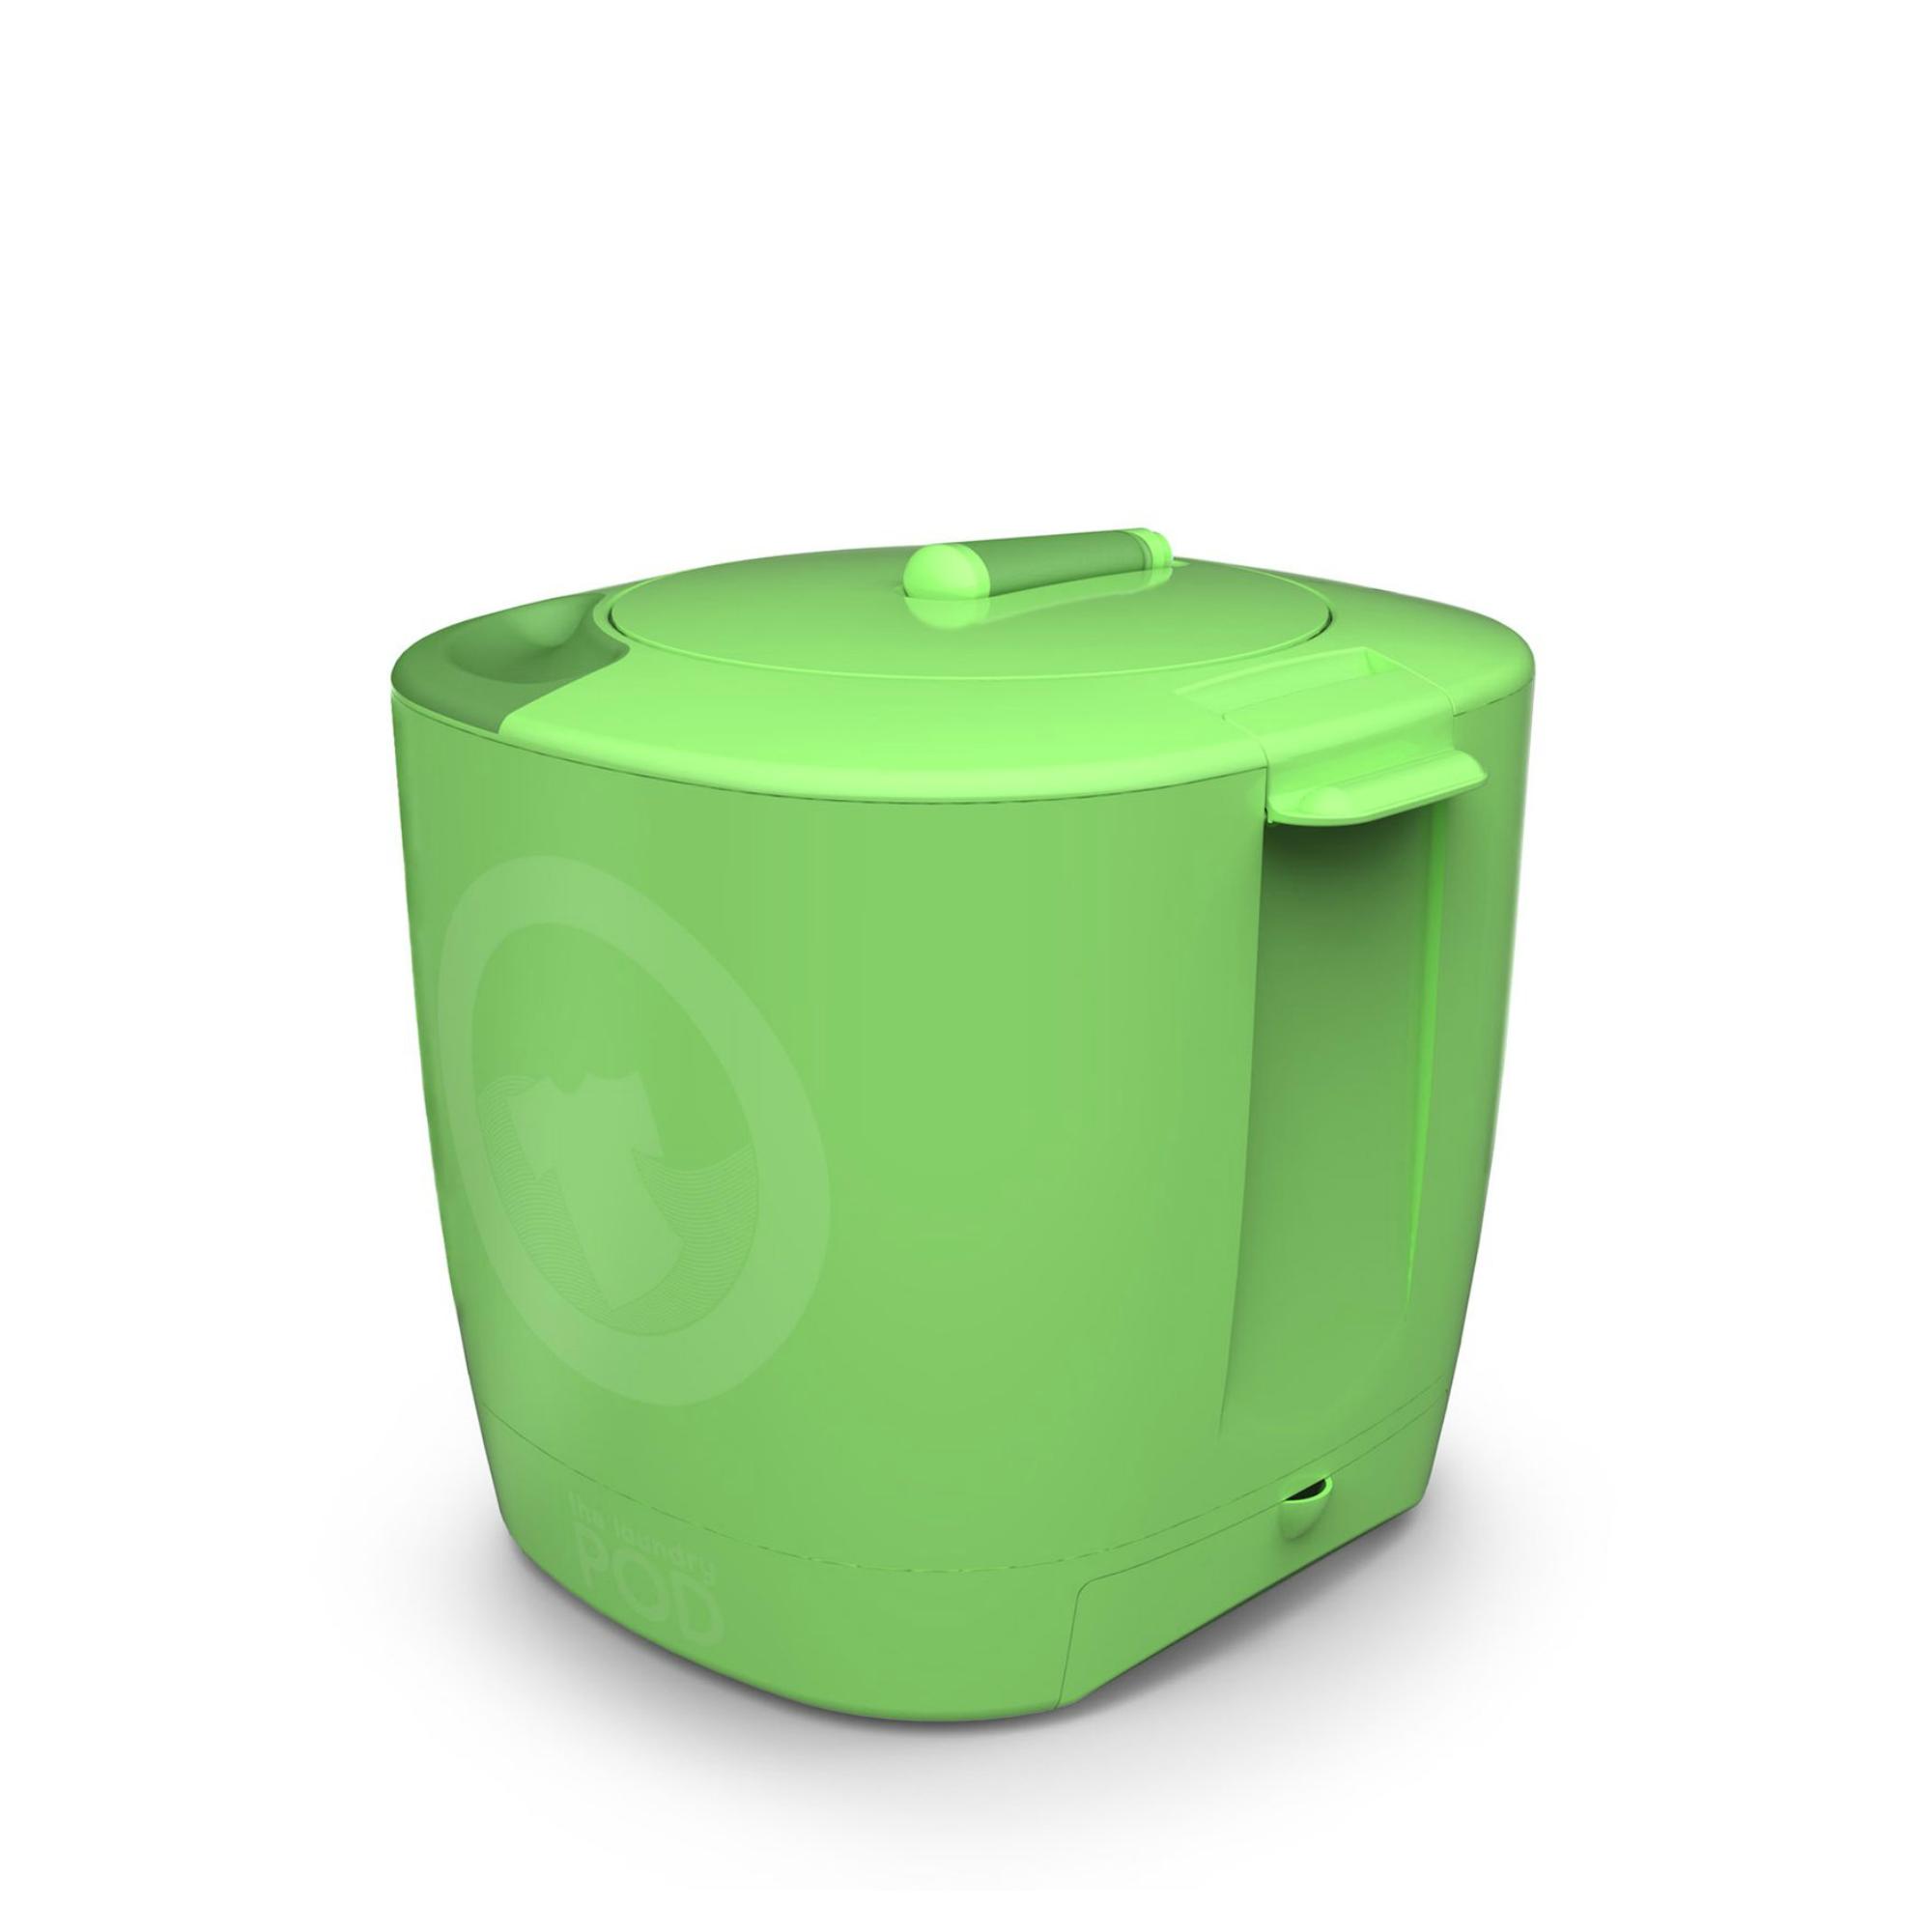 Designapplause Storebound Laundry Pod